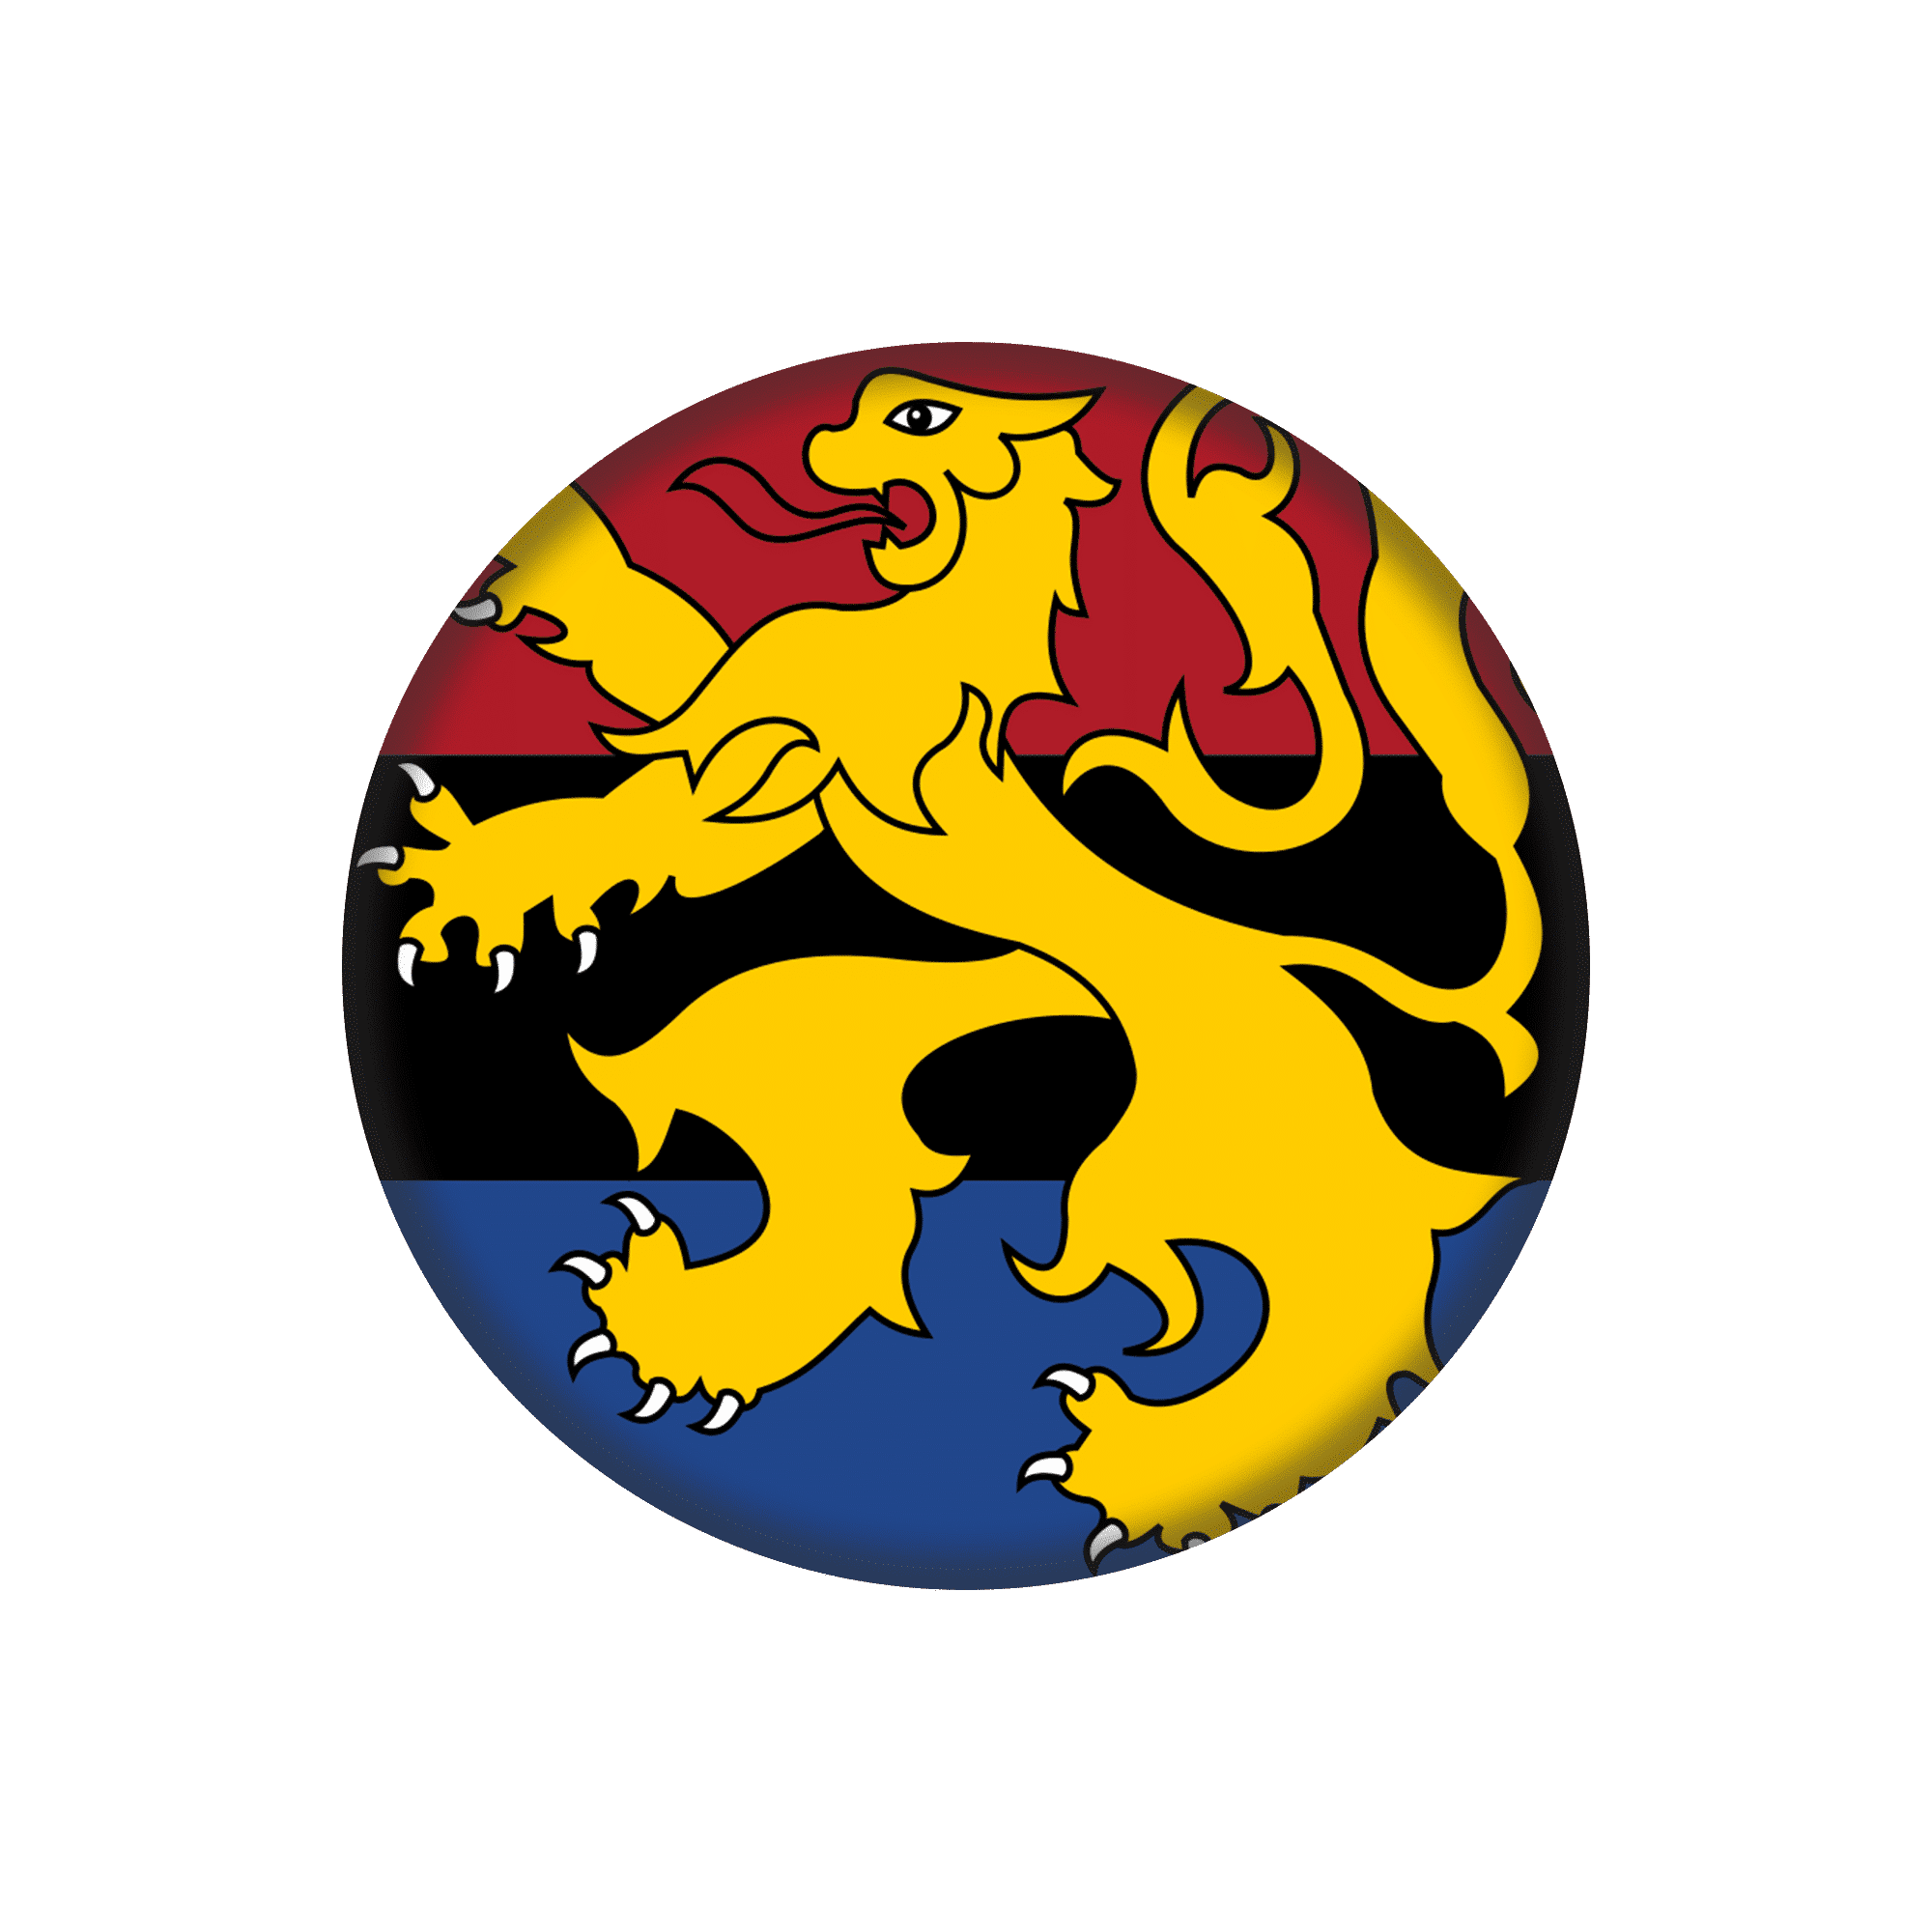 Trademark application Benelux